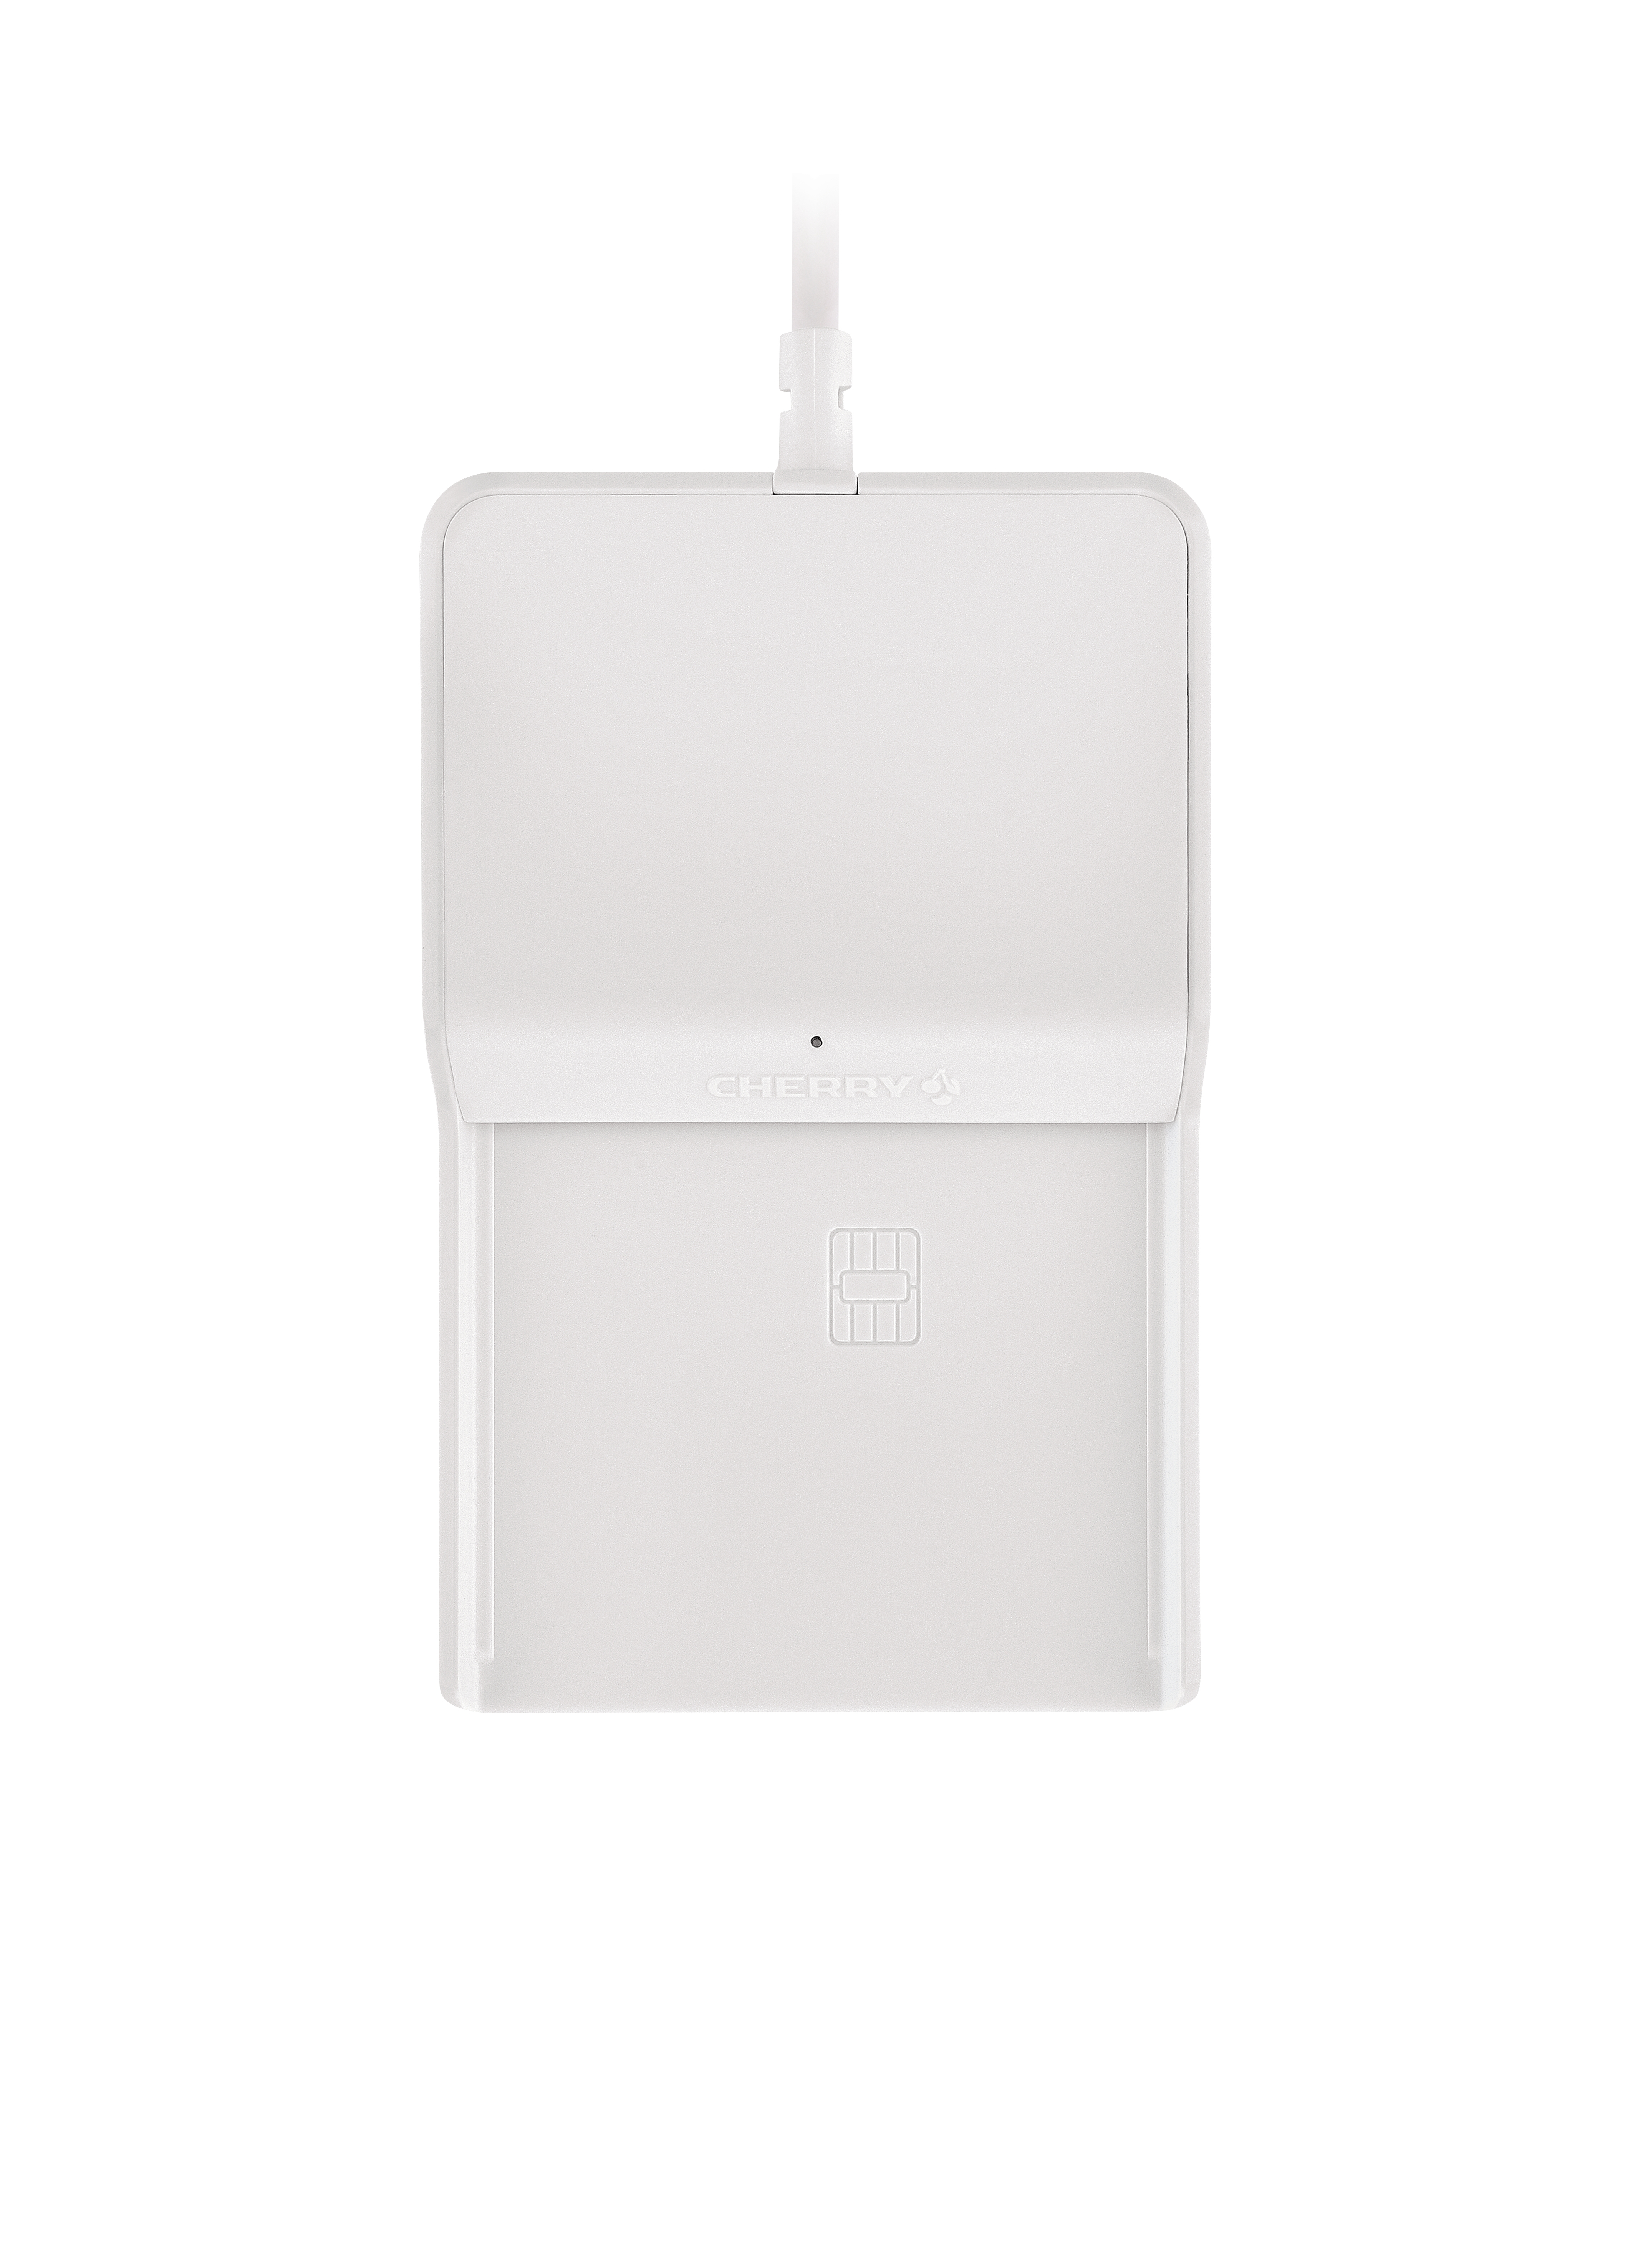 Cherry TC 1100 Innenraum USB 2.0 Grau Smart-Card-Lesegerät